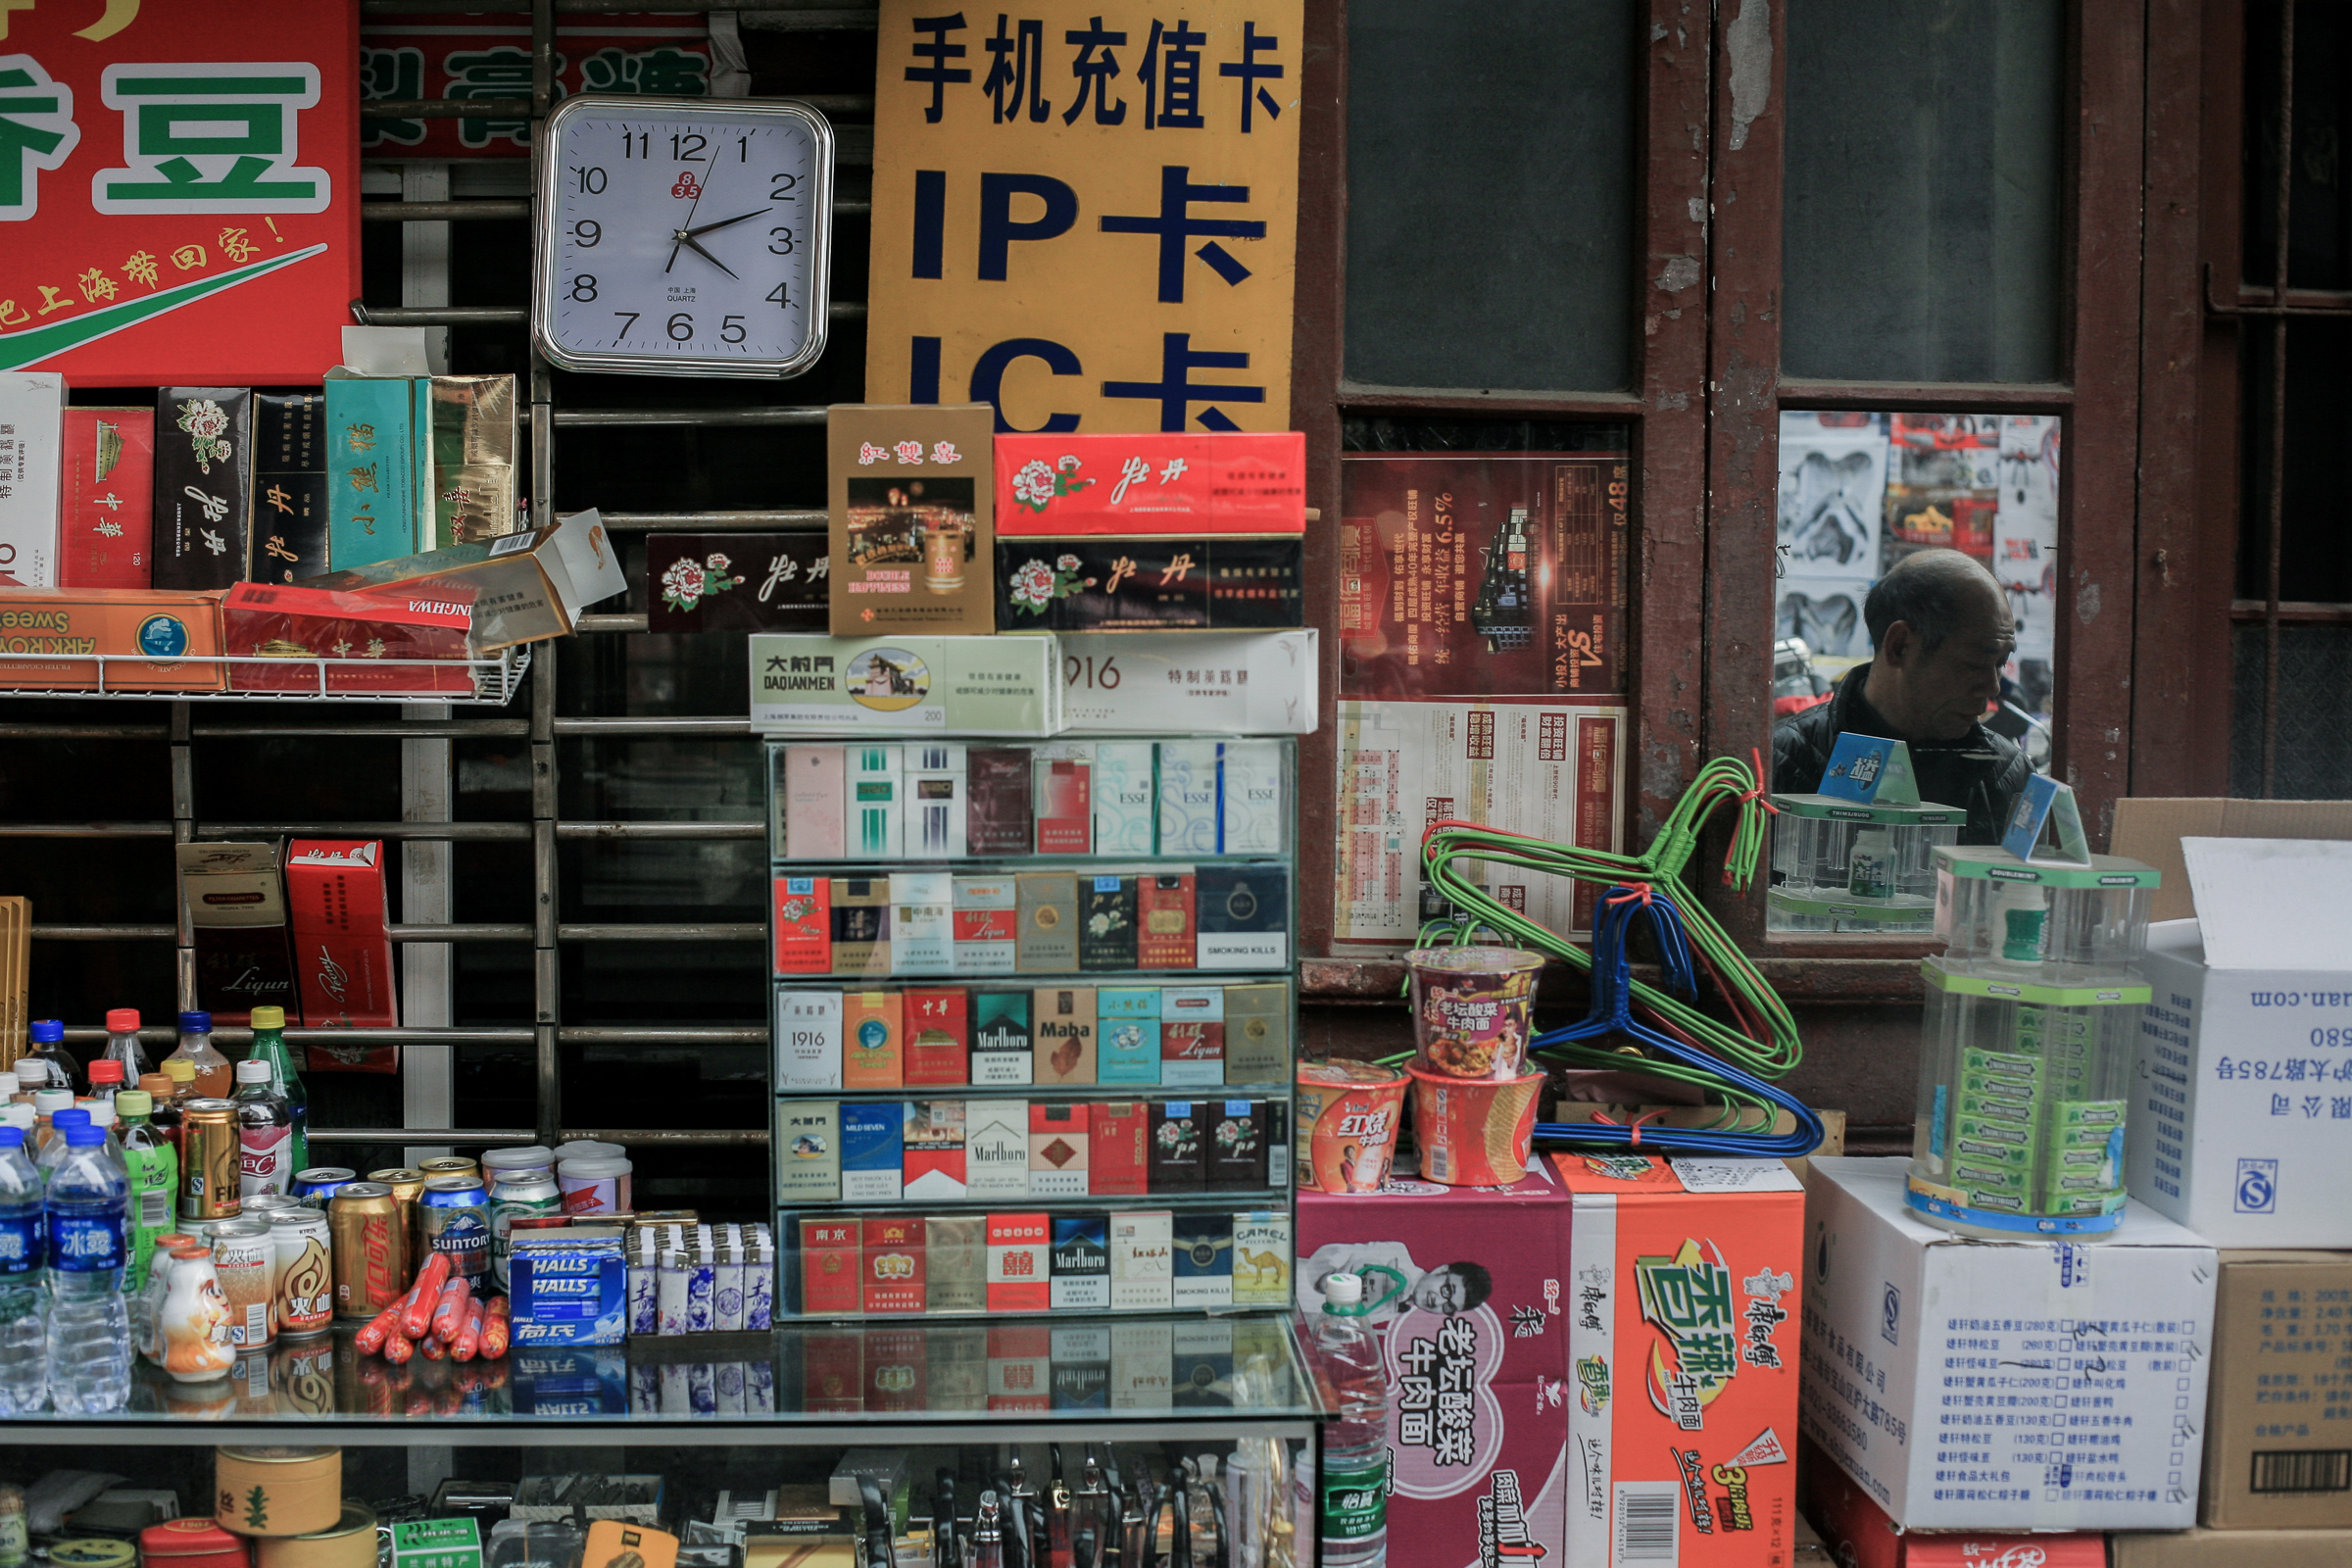 Old quarter vendor